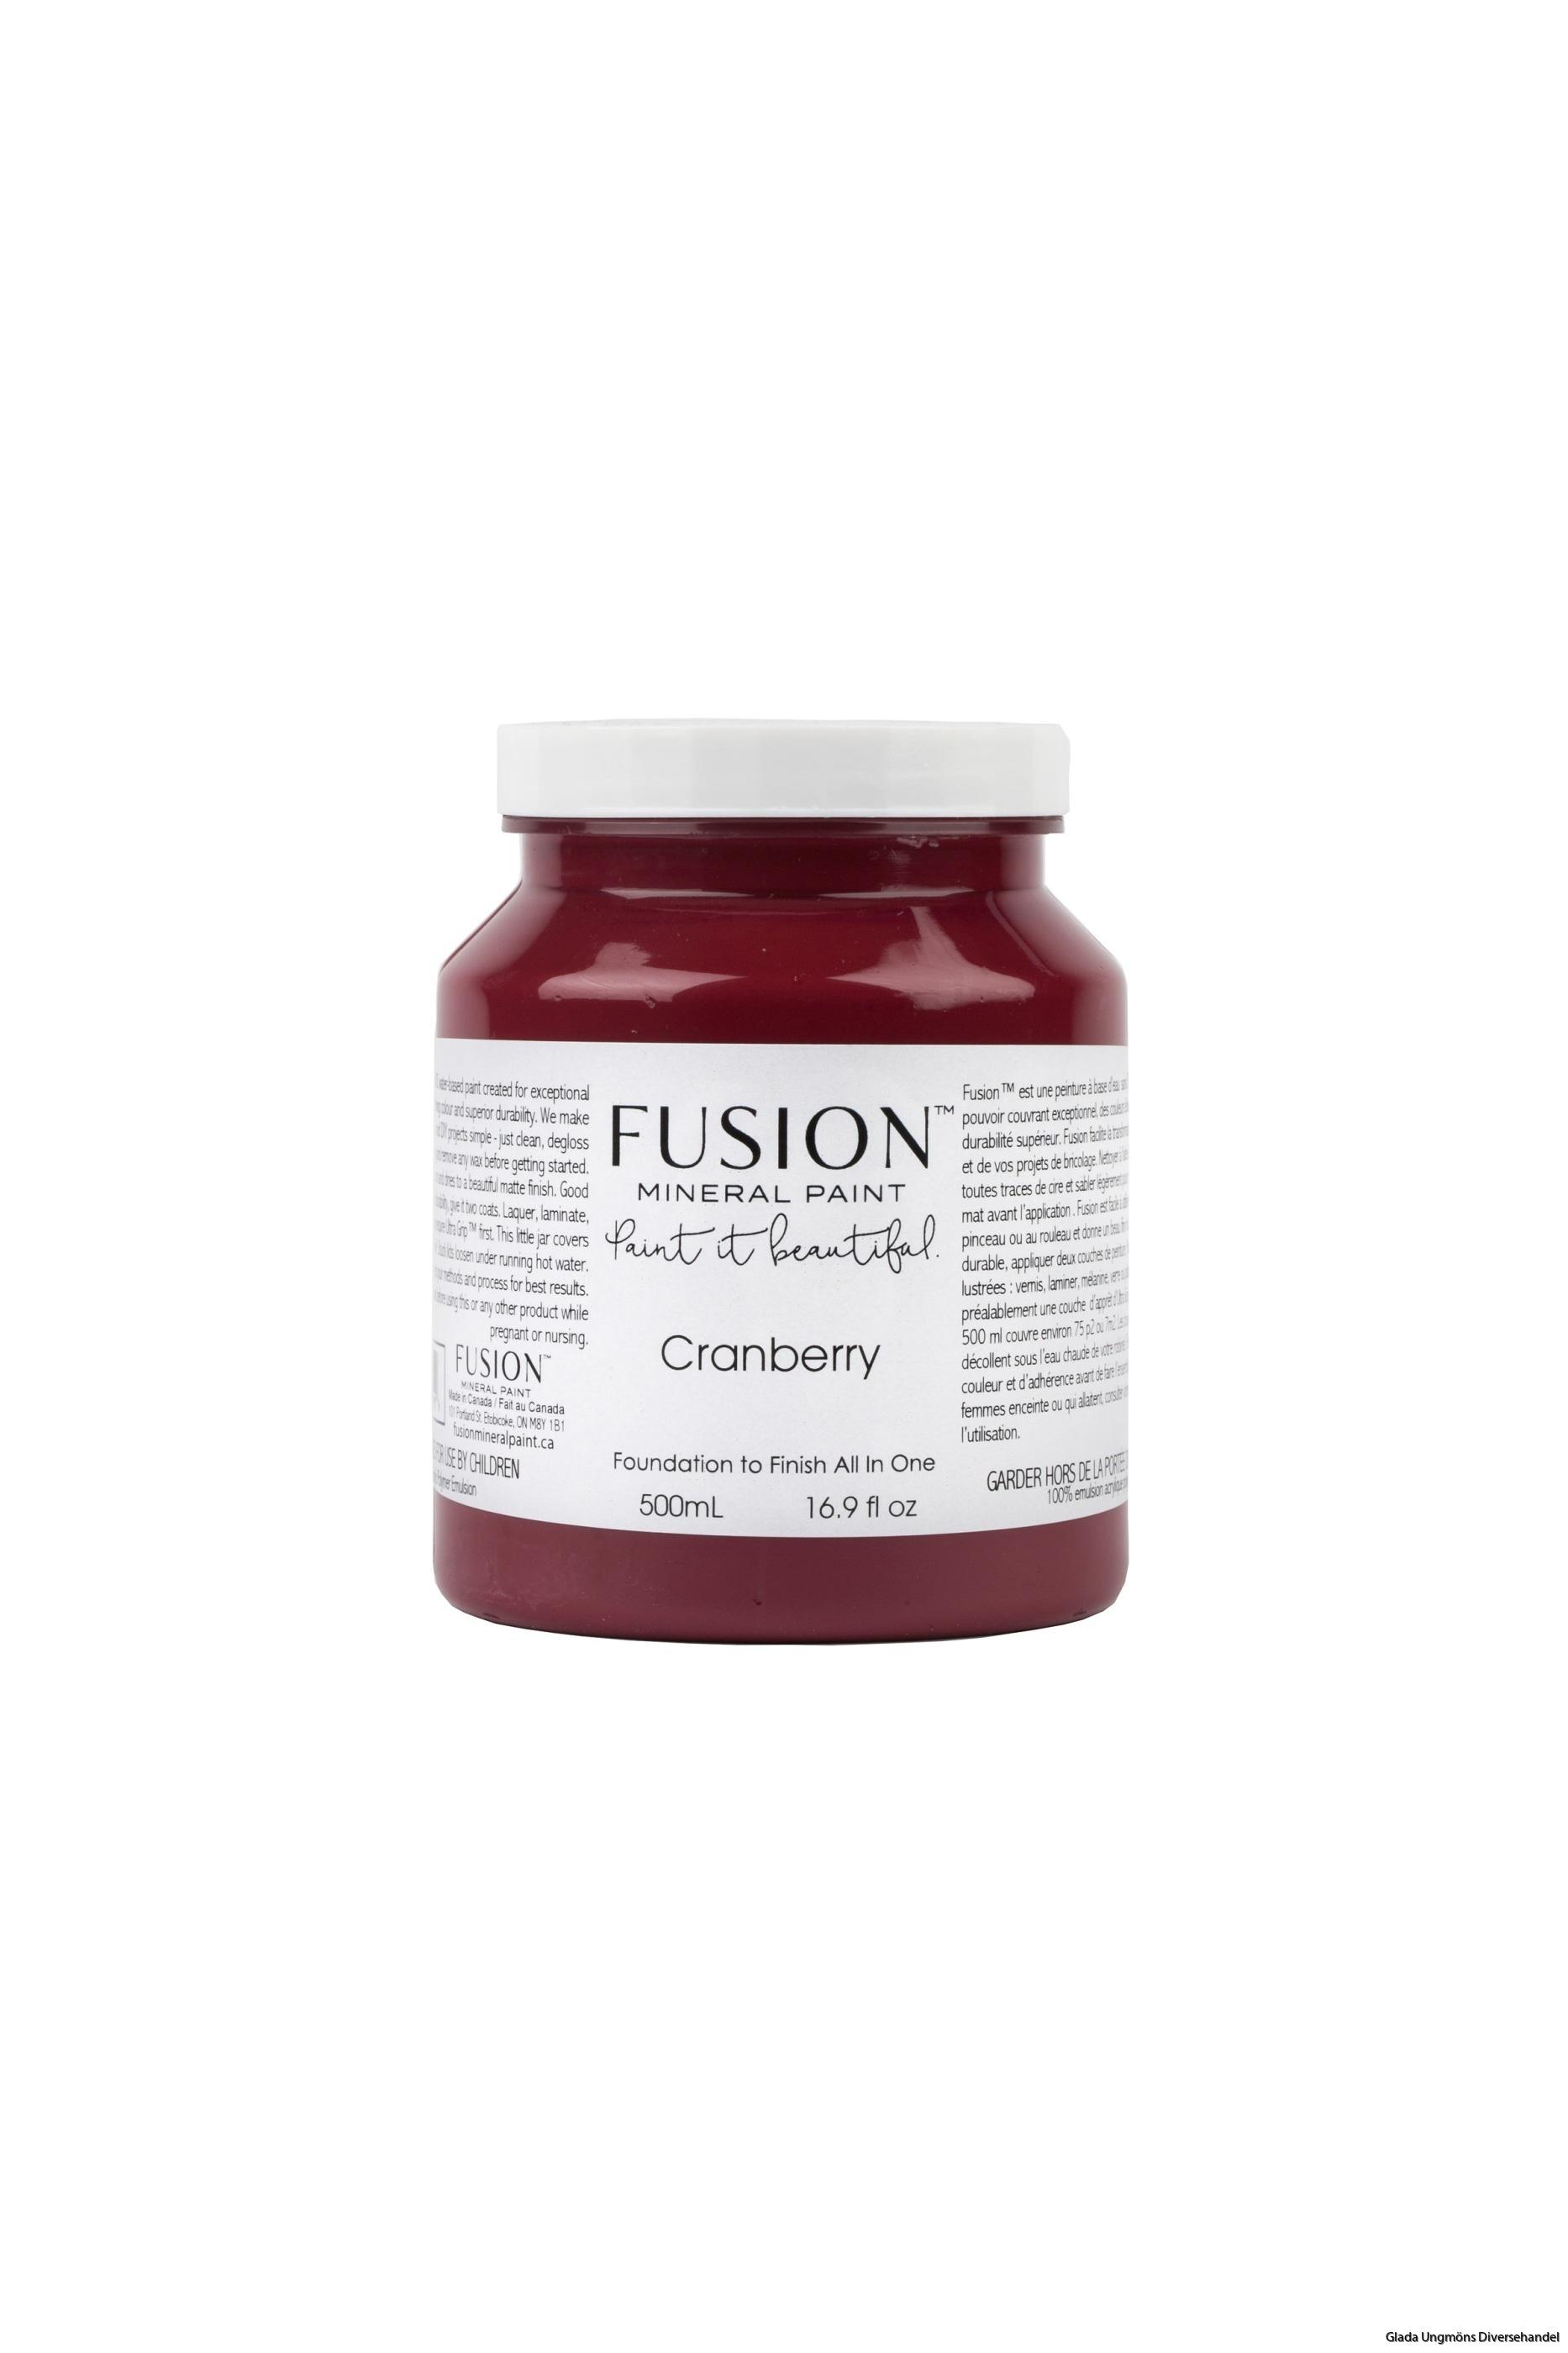 fusion_mineral_paint-cranberry-pint